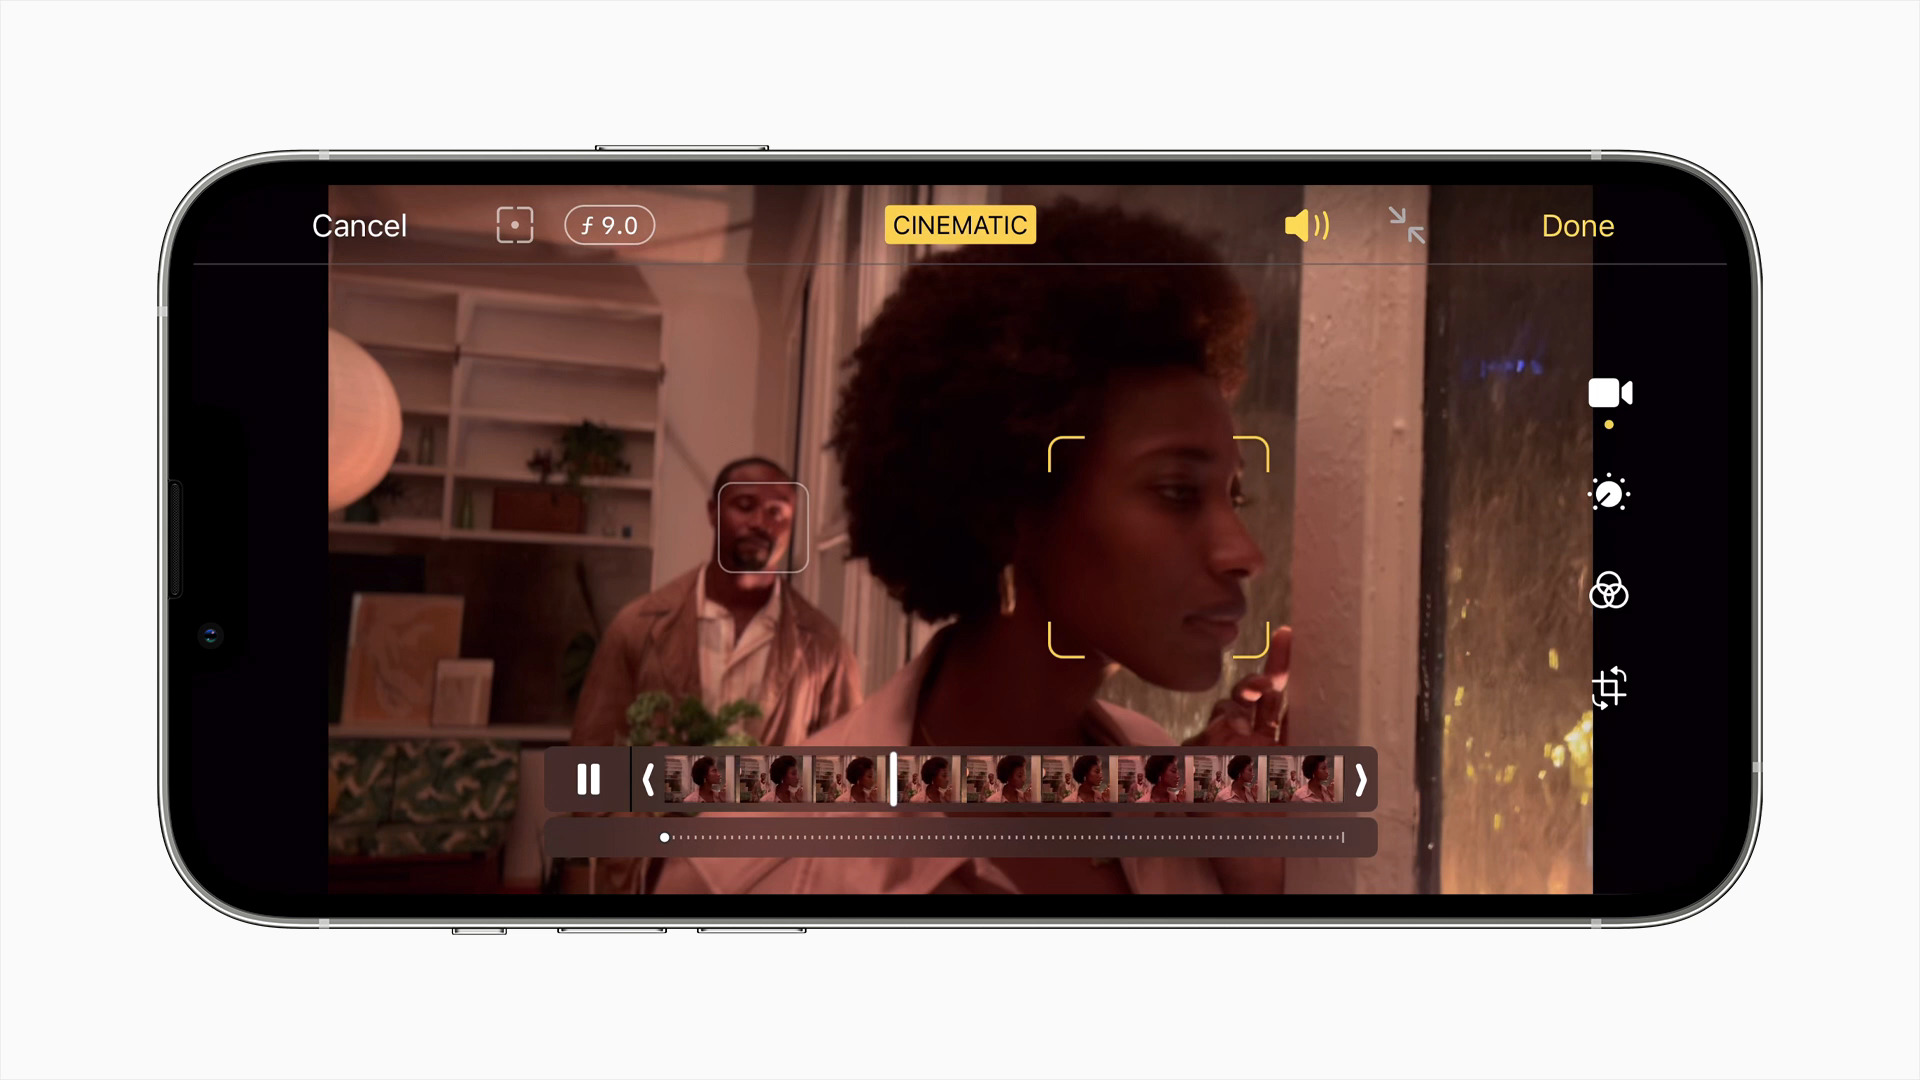 iPhone 13's cinematic mode